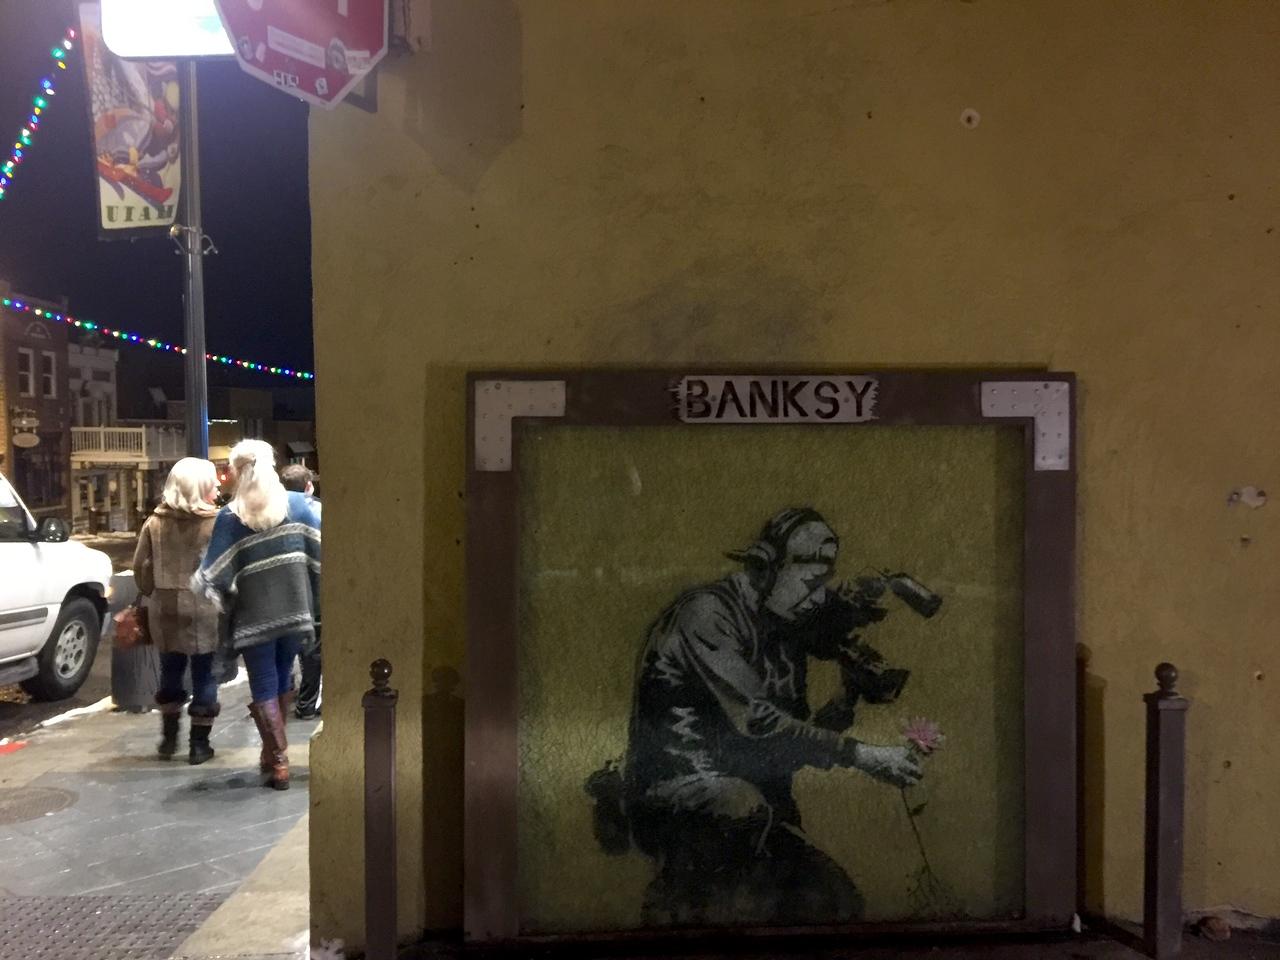 Banksy on Main St Park City